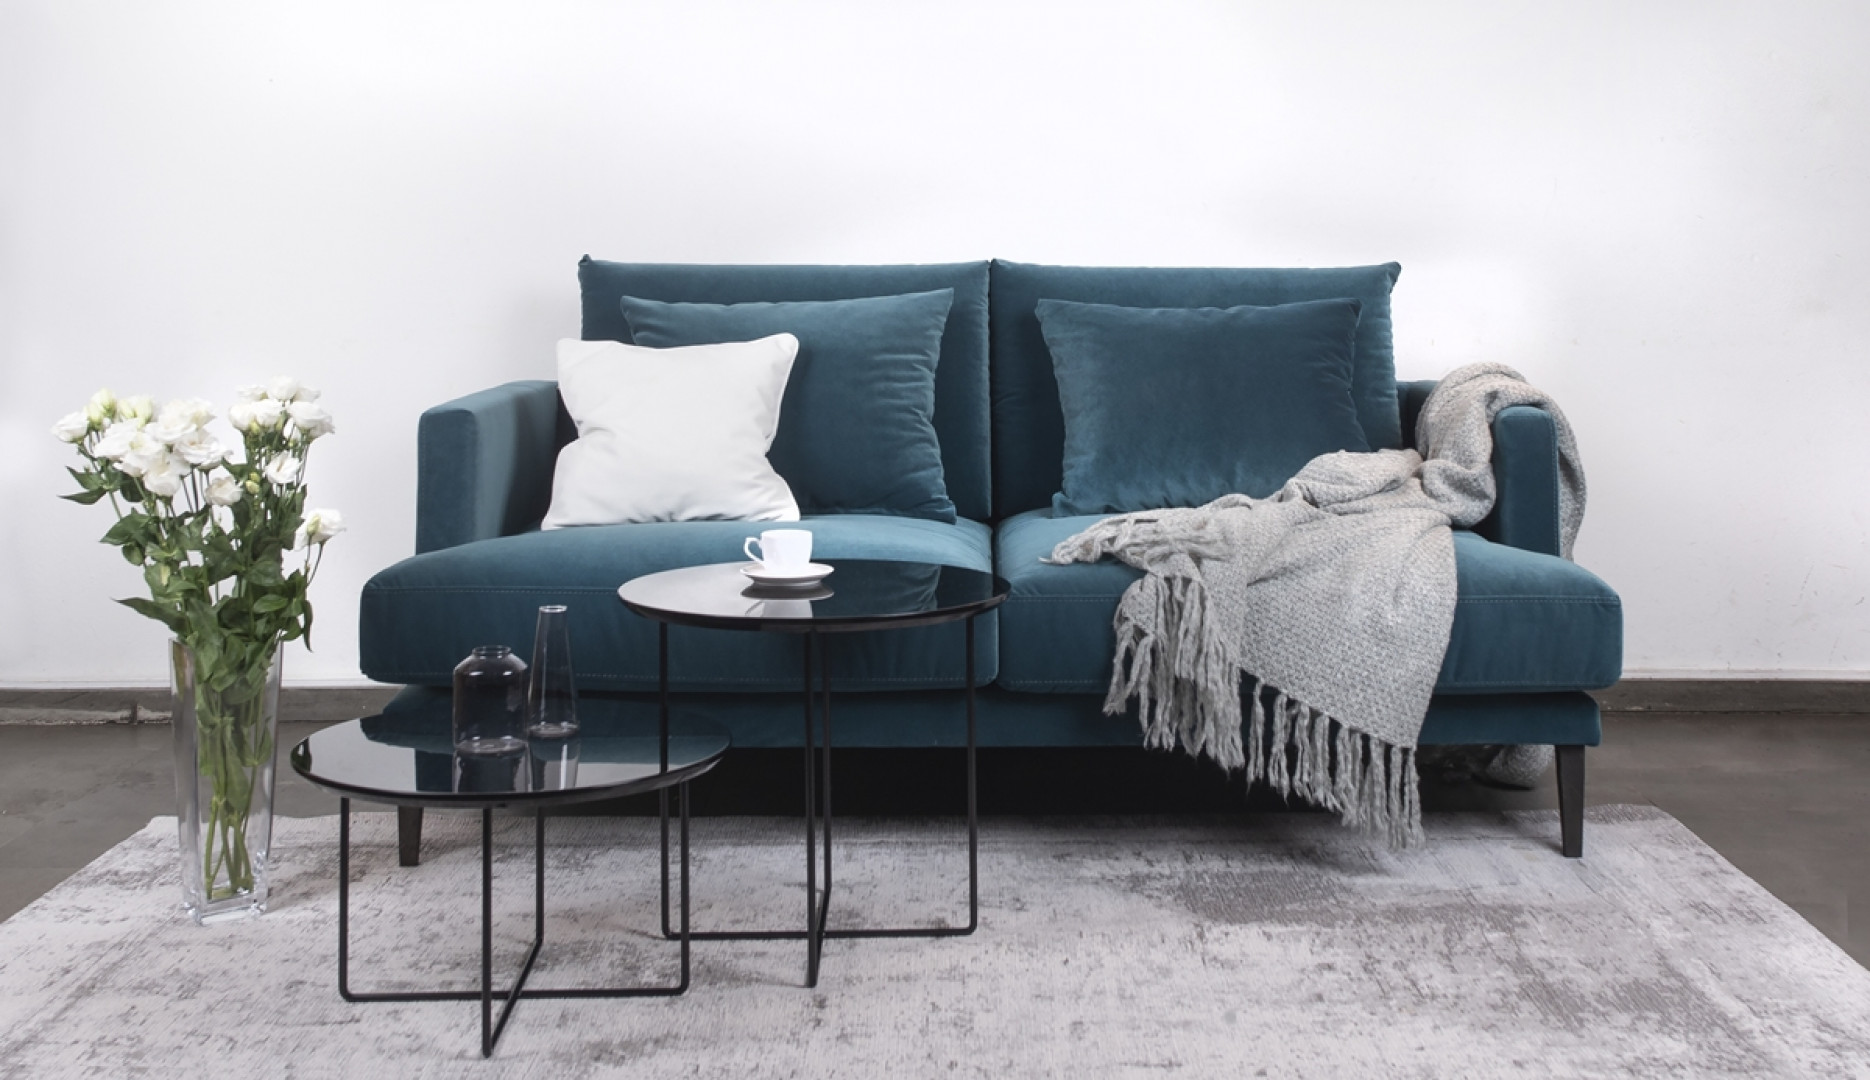 Sofa Rivia marki Rosanero. Fot. Rosanero